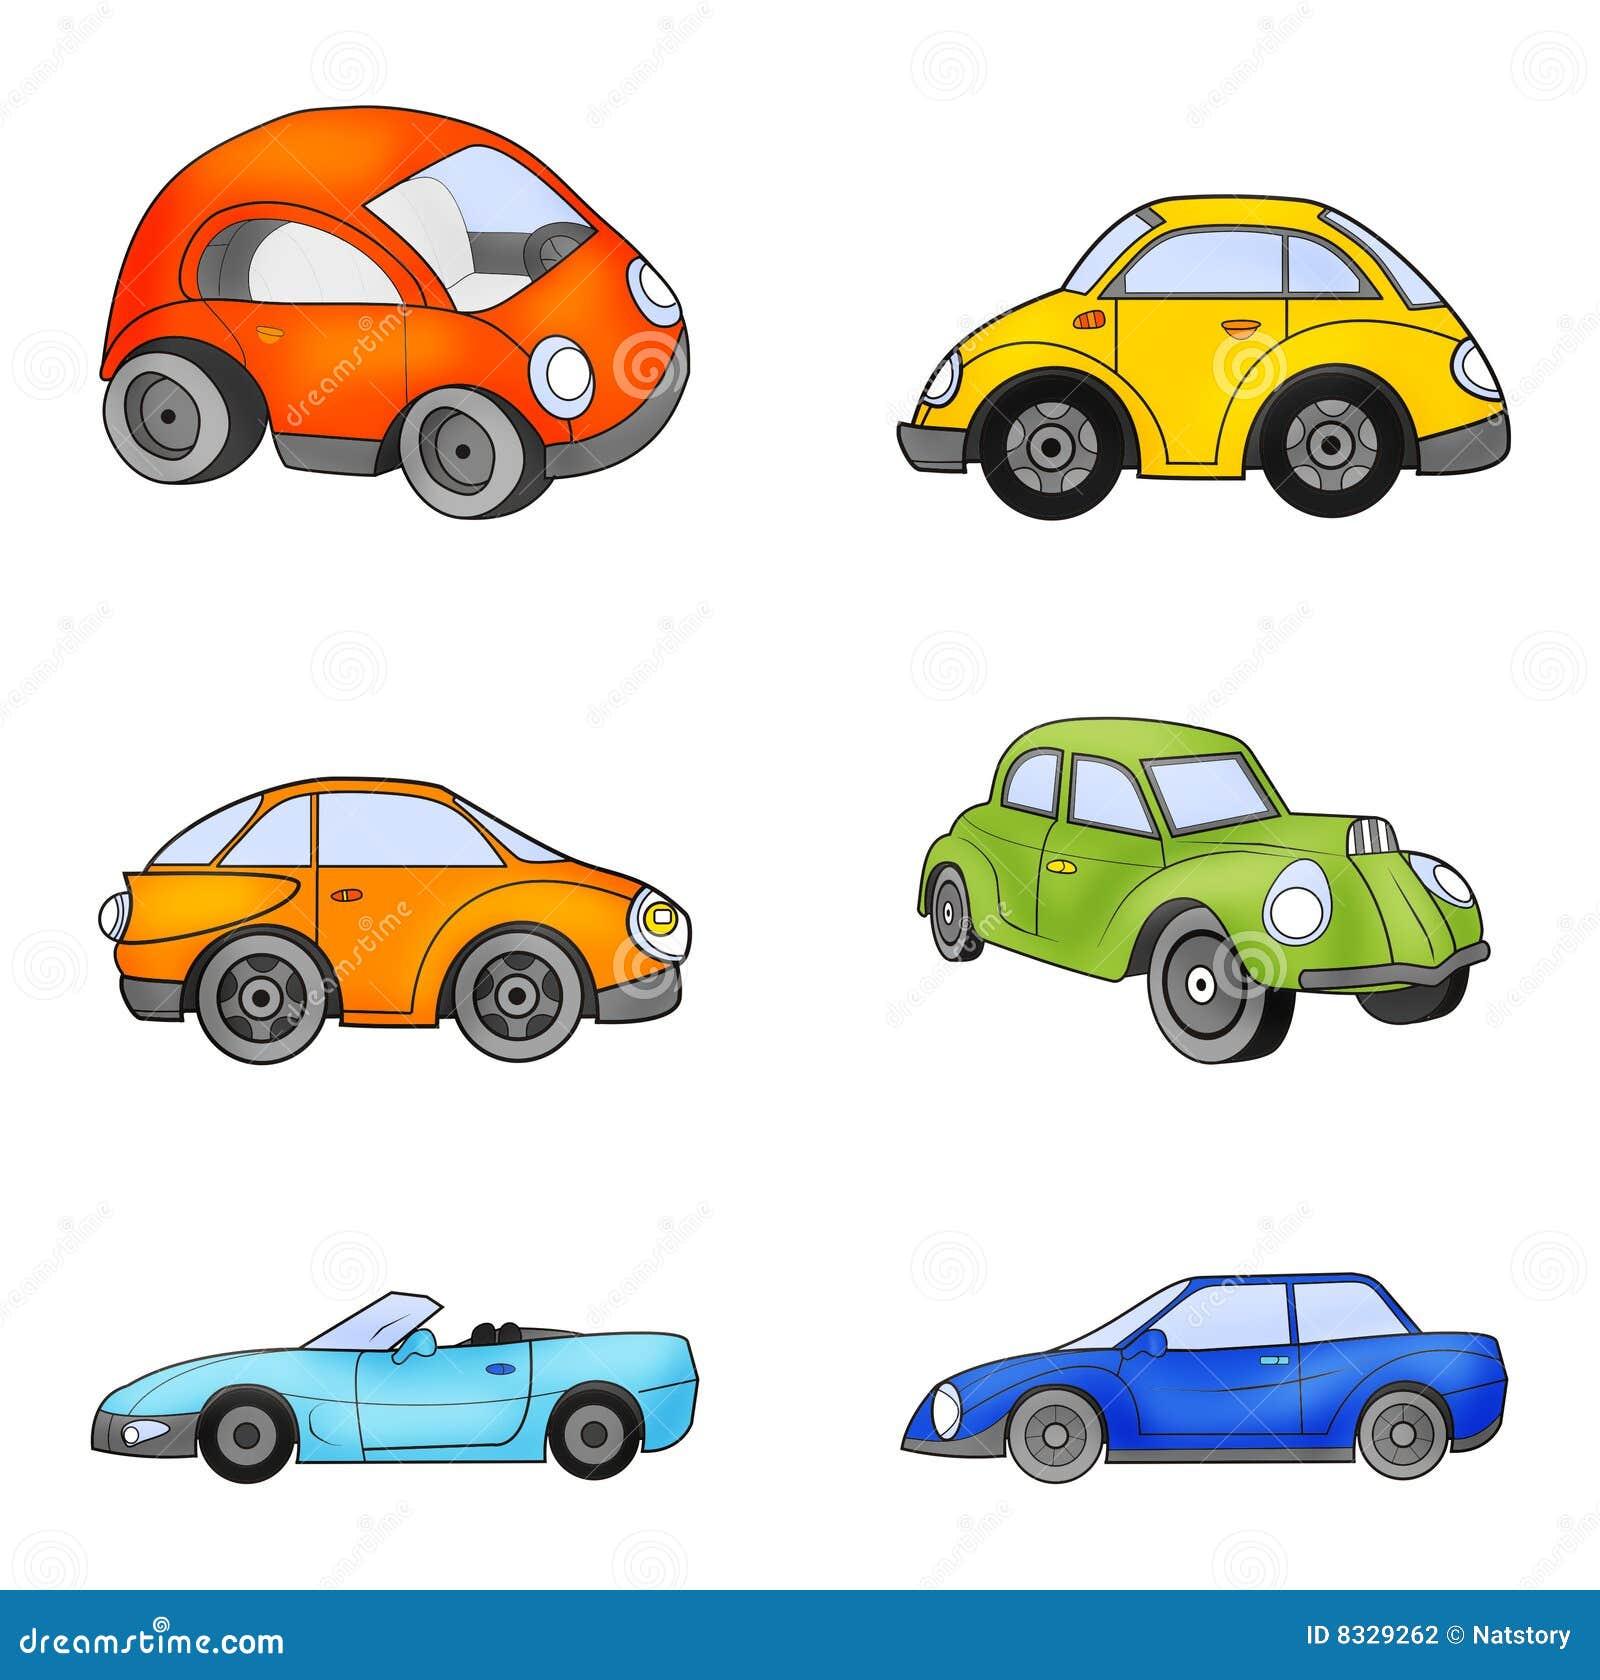 Toy Car Clip Art : Toy cars stock illustration of orange green